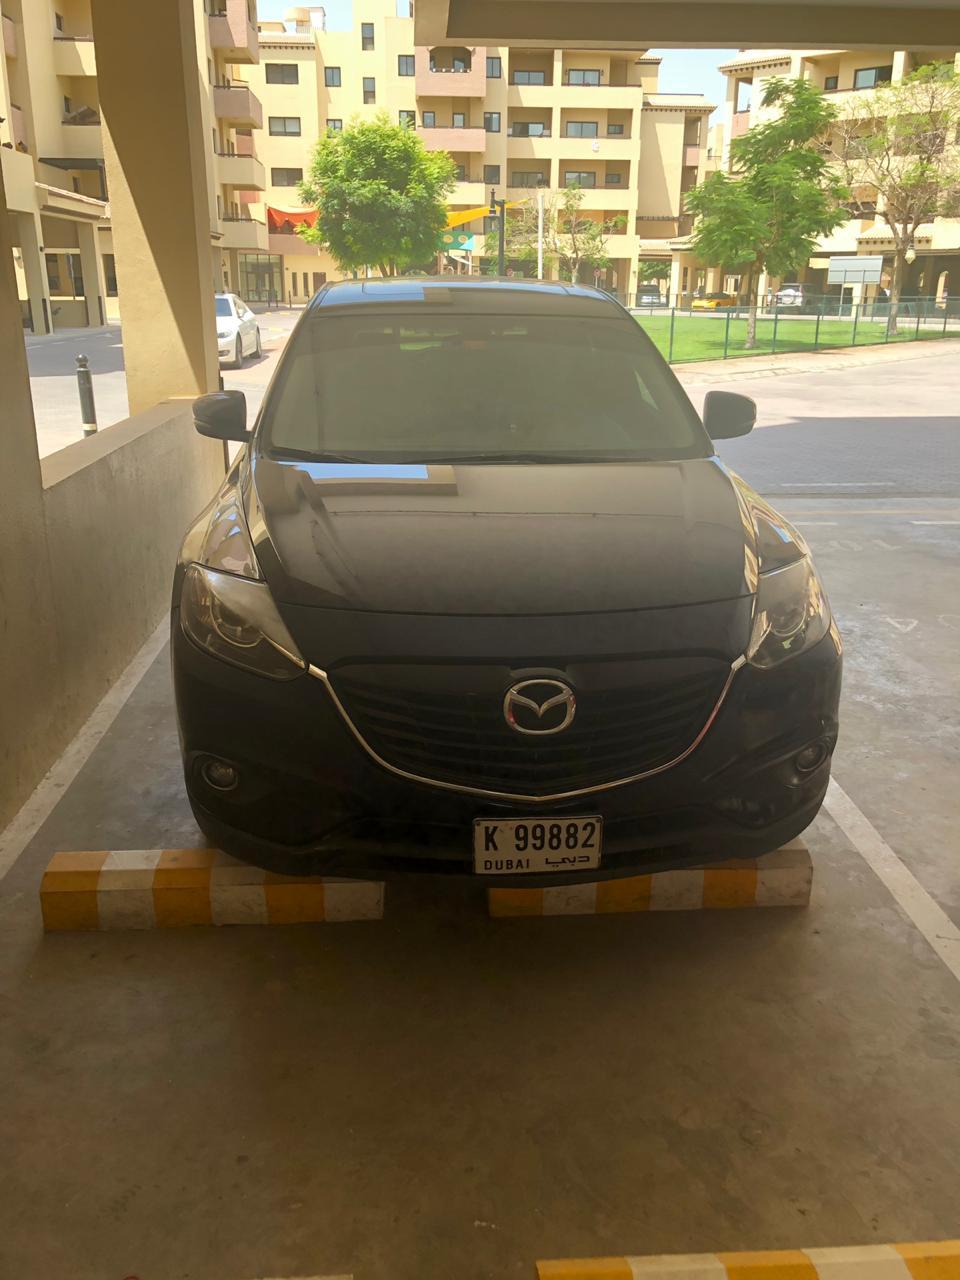 Mazda CX-9 2015 – Carooza   USED-NEW CARS FOR SALE   SELL CARS   سوق السيارات في الأمارات